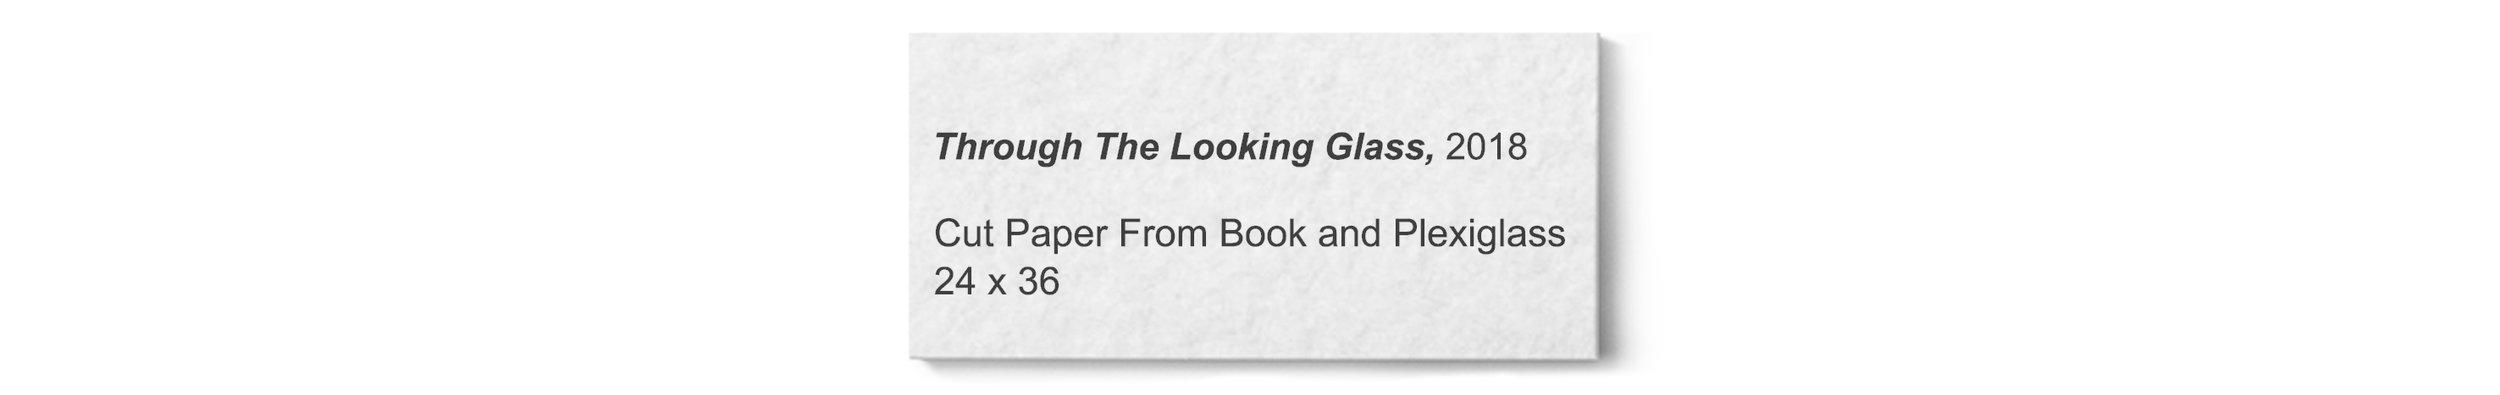 © David Gary Lloyd - Label - Through The Looking Glass.jpg